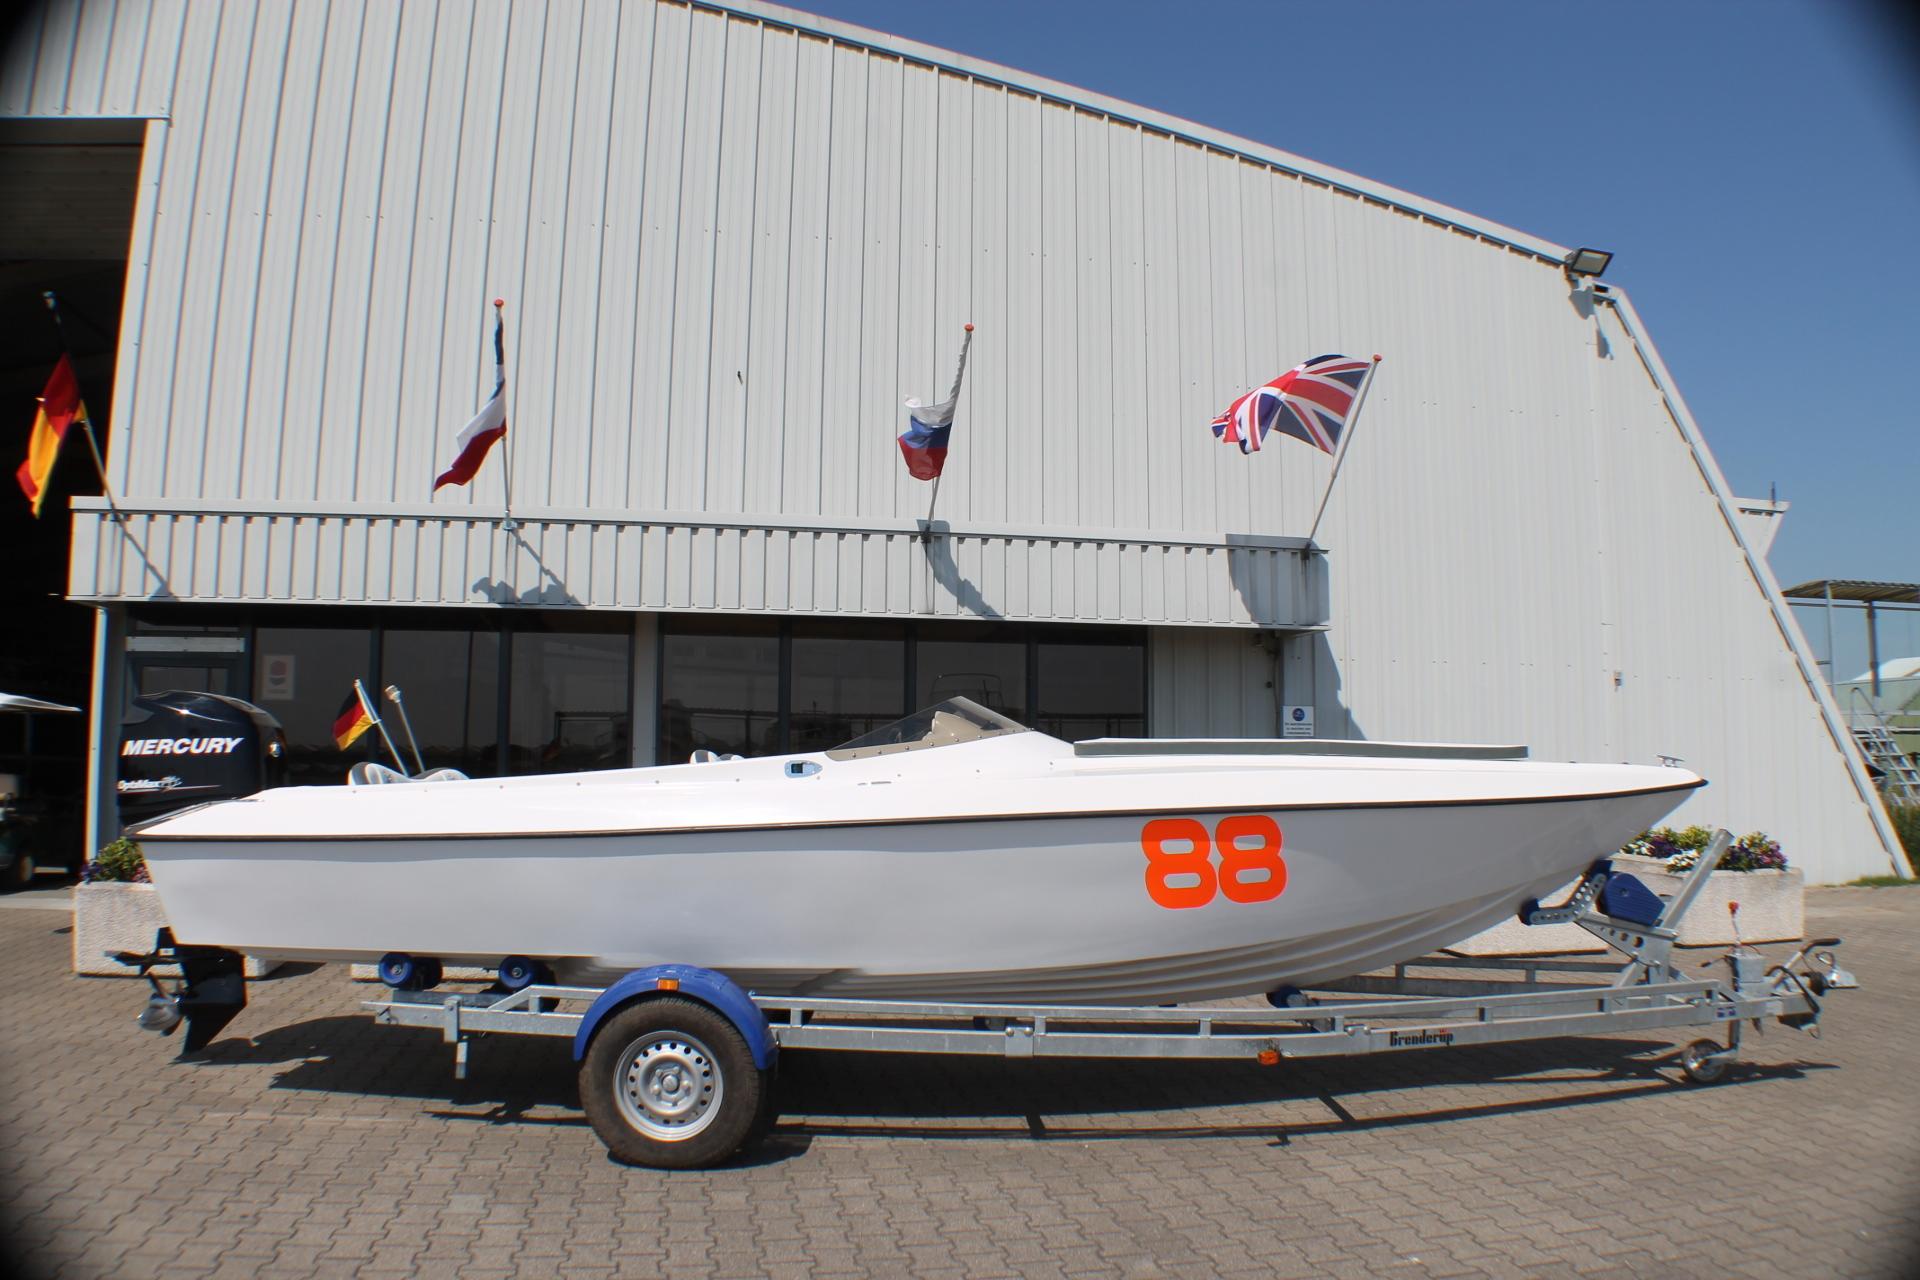 Tom-Car-Boats Tintorera